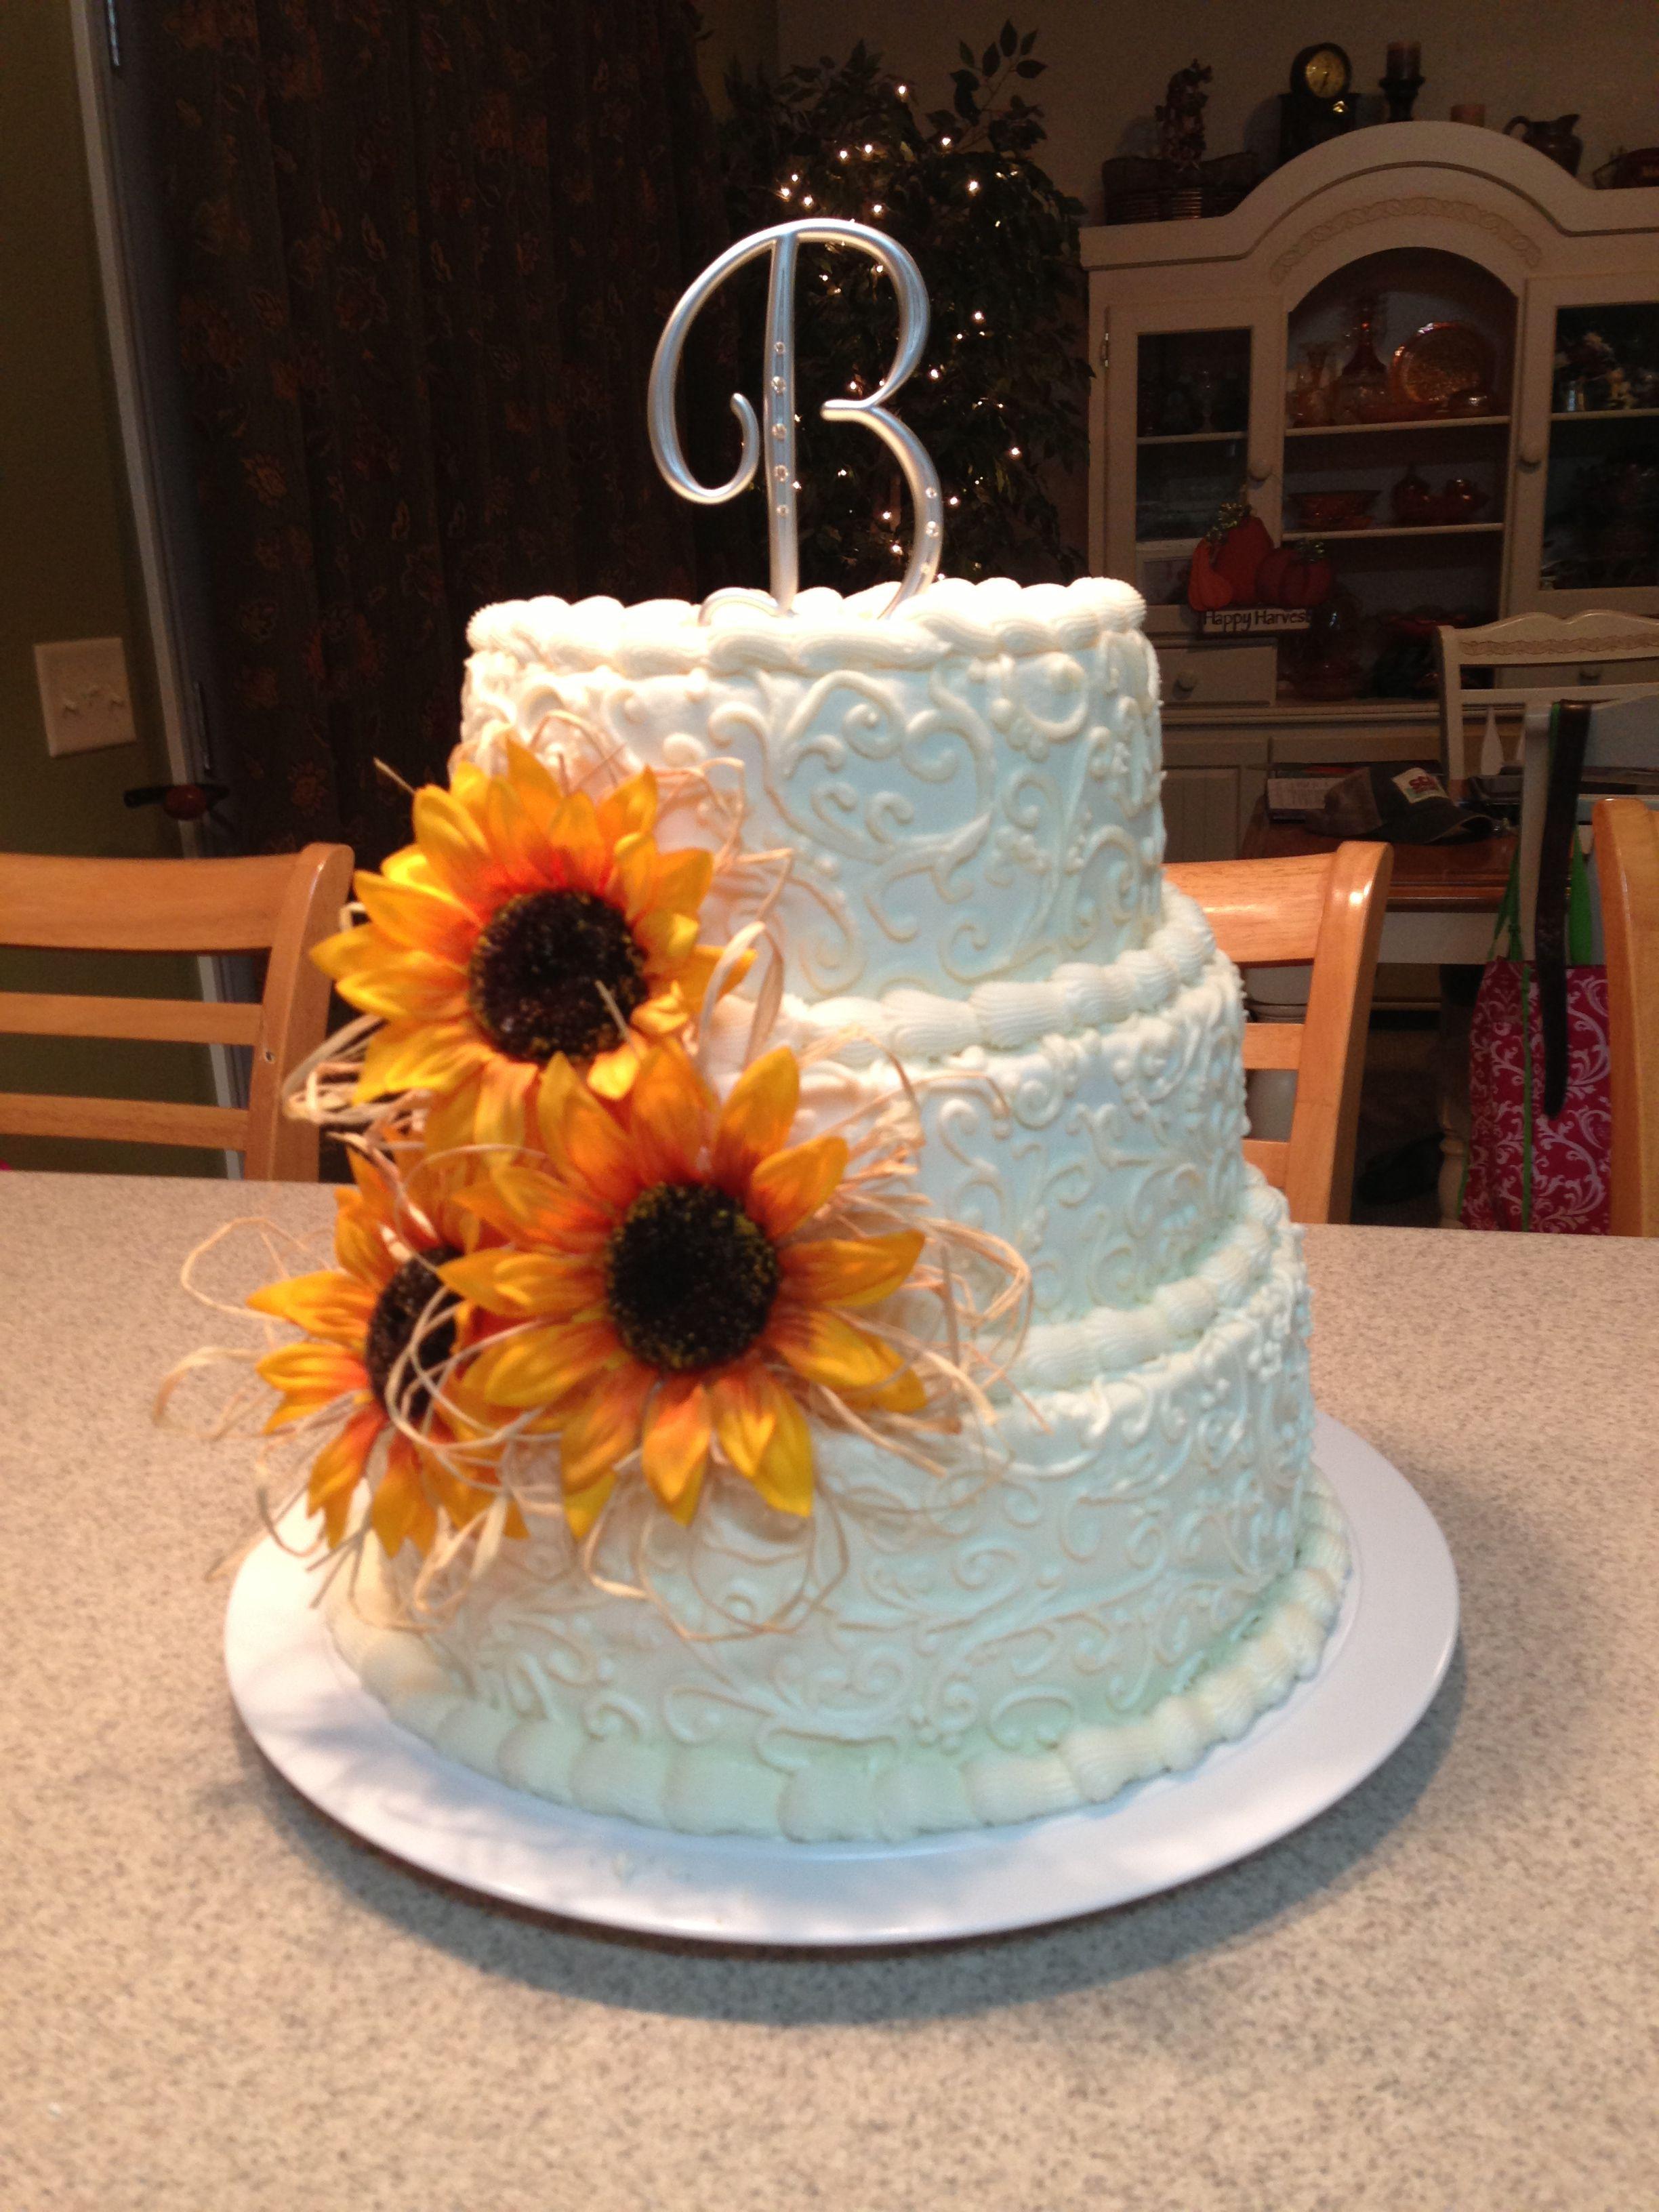 Sunflowers Wedding Cupcake Cake Ideas and Designs